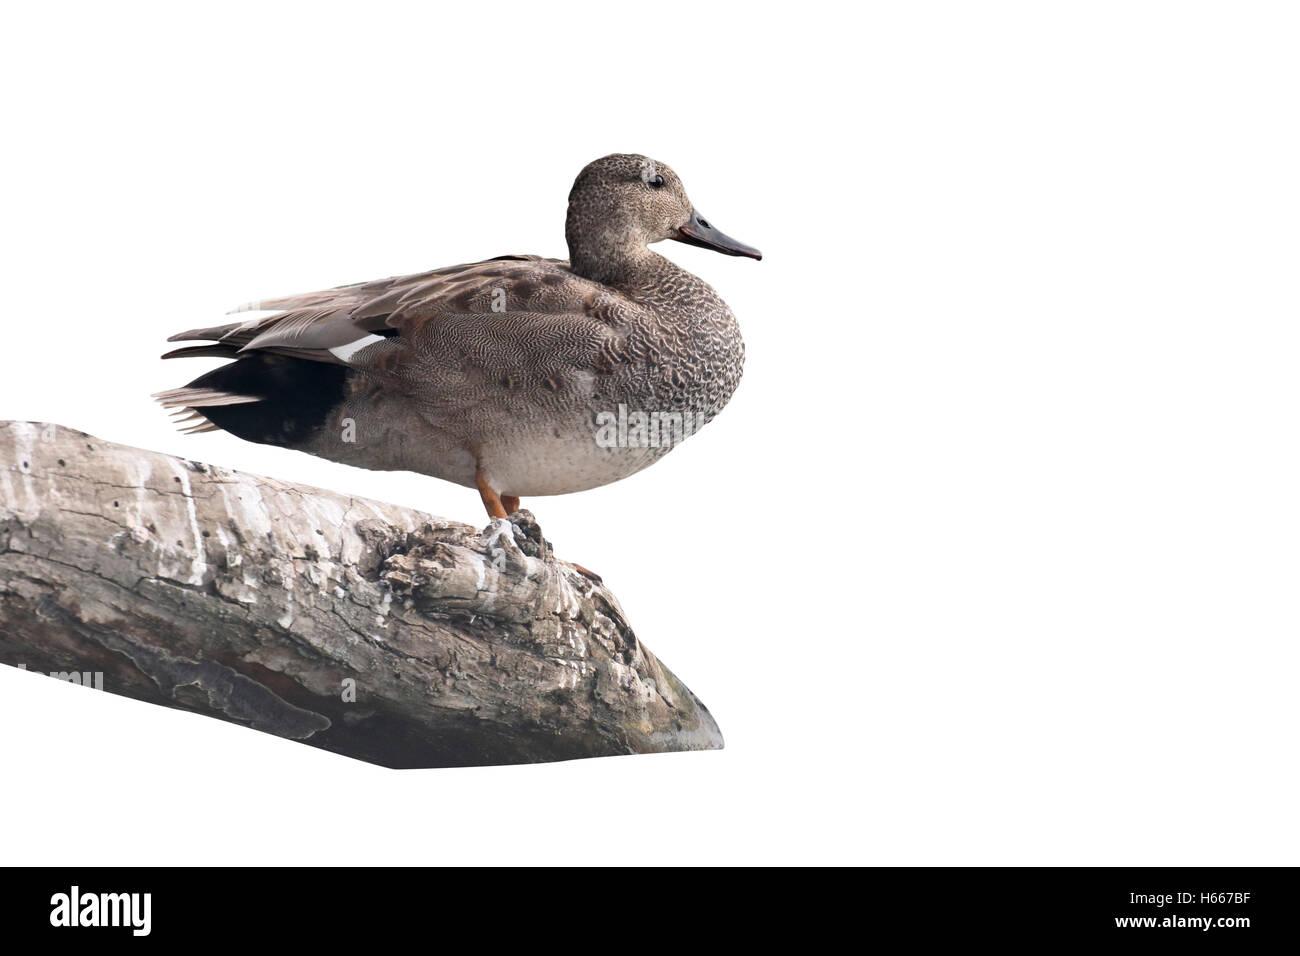 Gadwall, Anas strepera, single male by water, Hungary, May 2016 - Stock Image